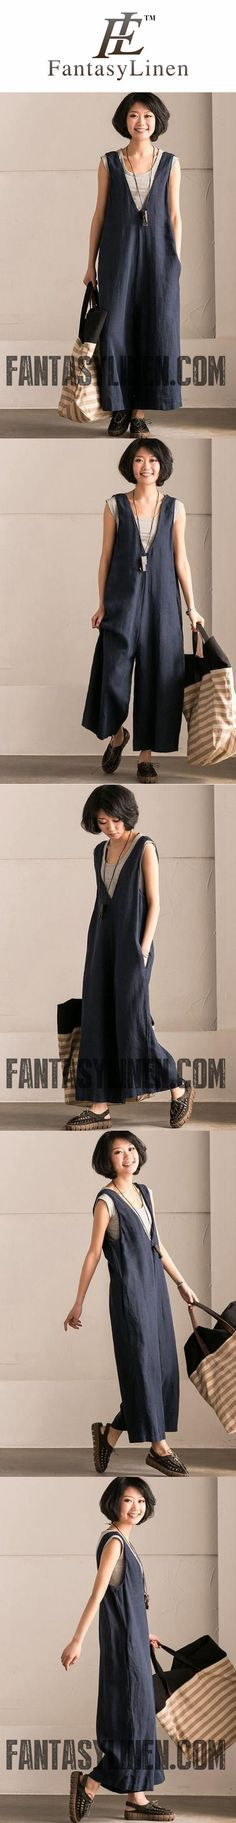 BLUE V-NECK CAUSAL COTTON LINEN OVERSIZE OVERALLS WOMEN CLOTHES K289BG